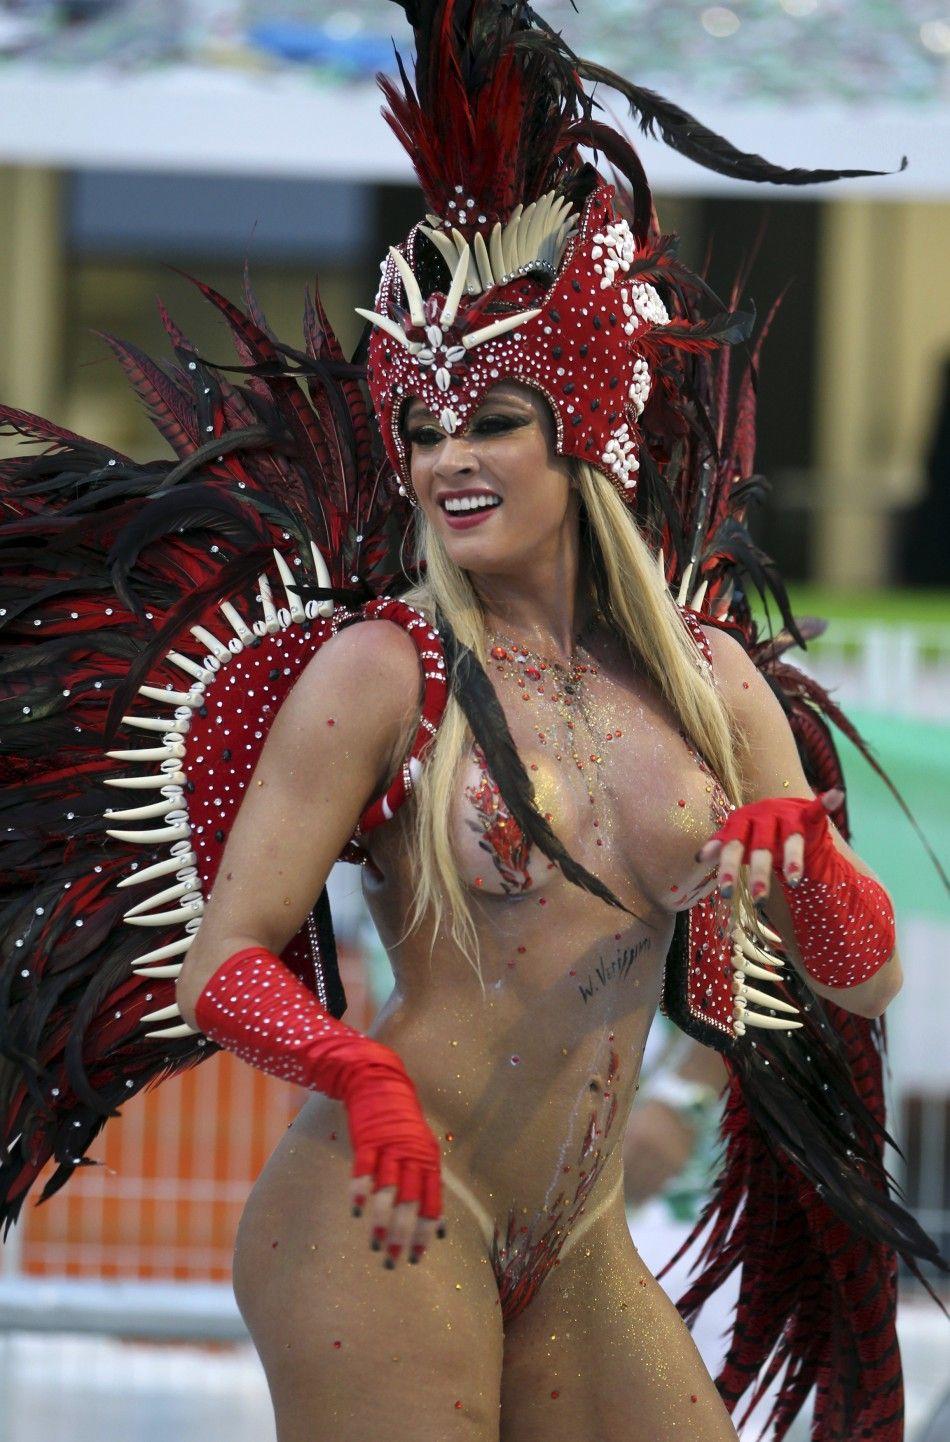 tumblr Brazil carnival women